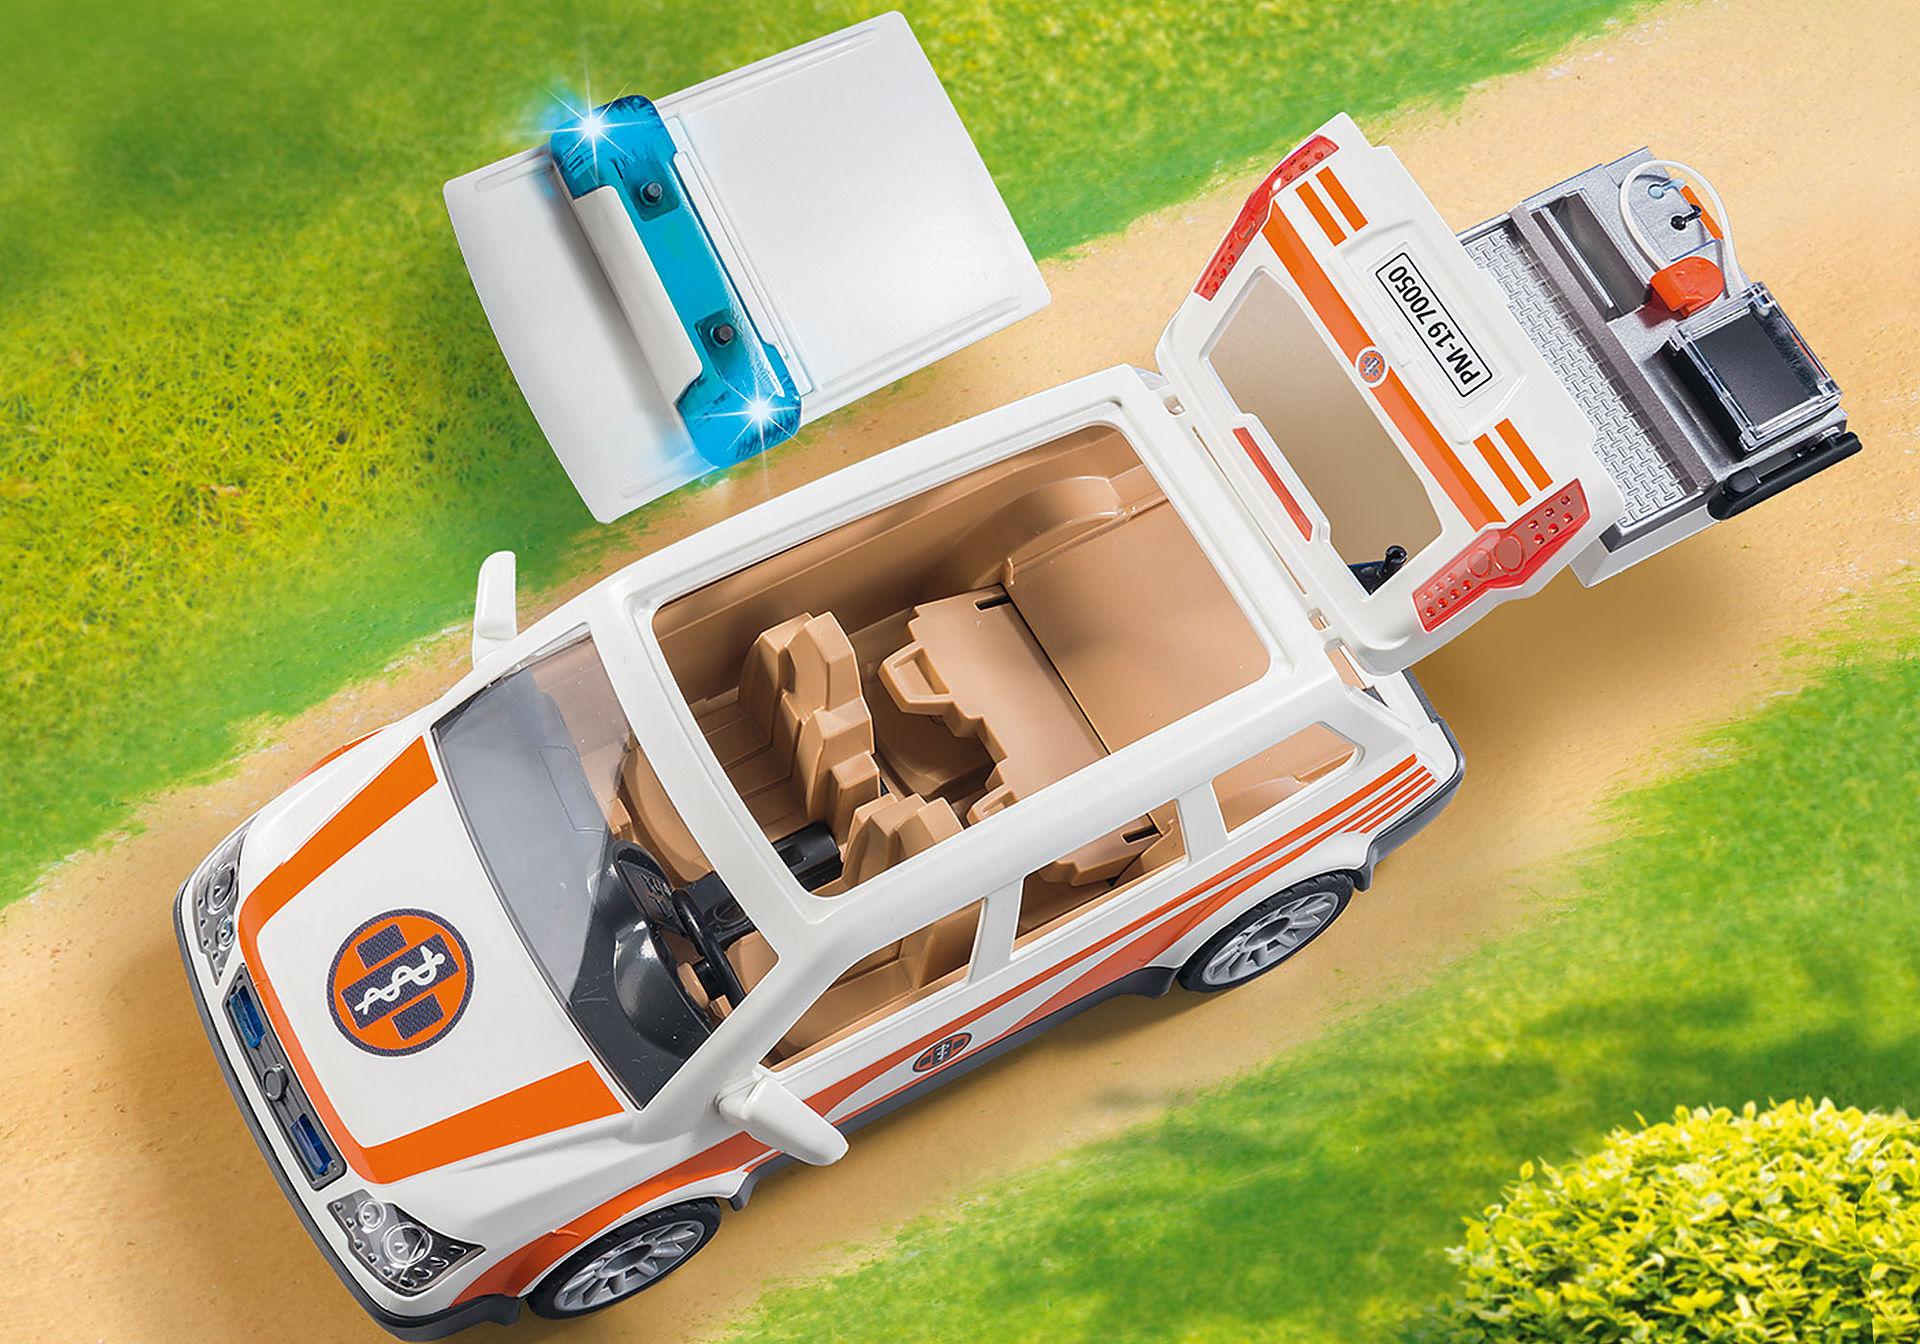 http://media.playmobil.com/i/playmobil/70050_product_extra2/Voiture et ambulanciers